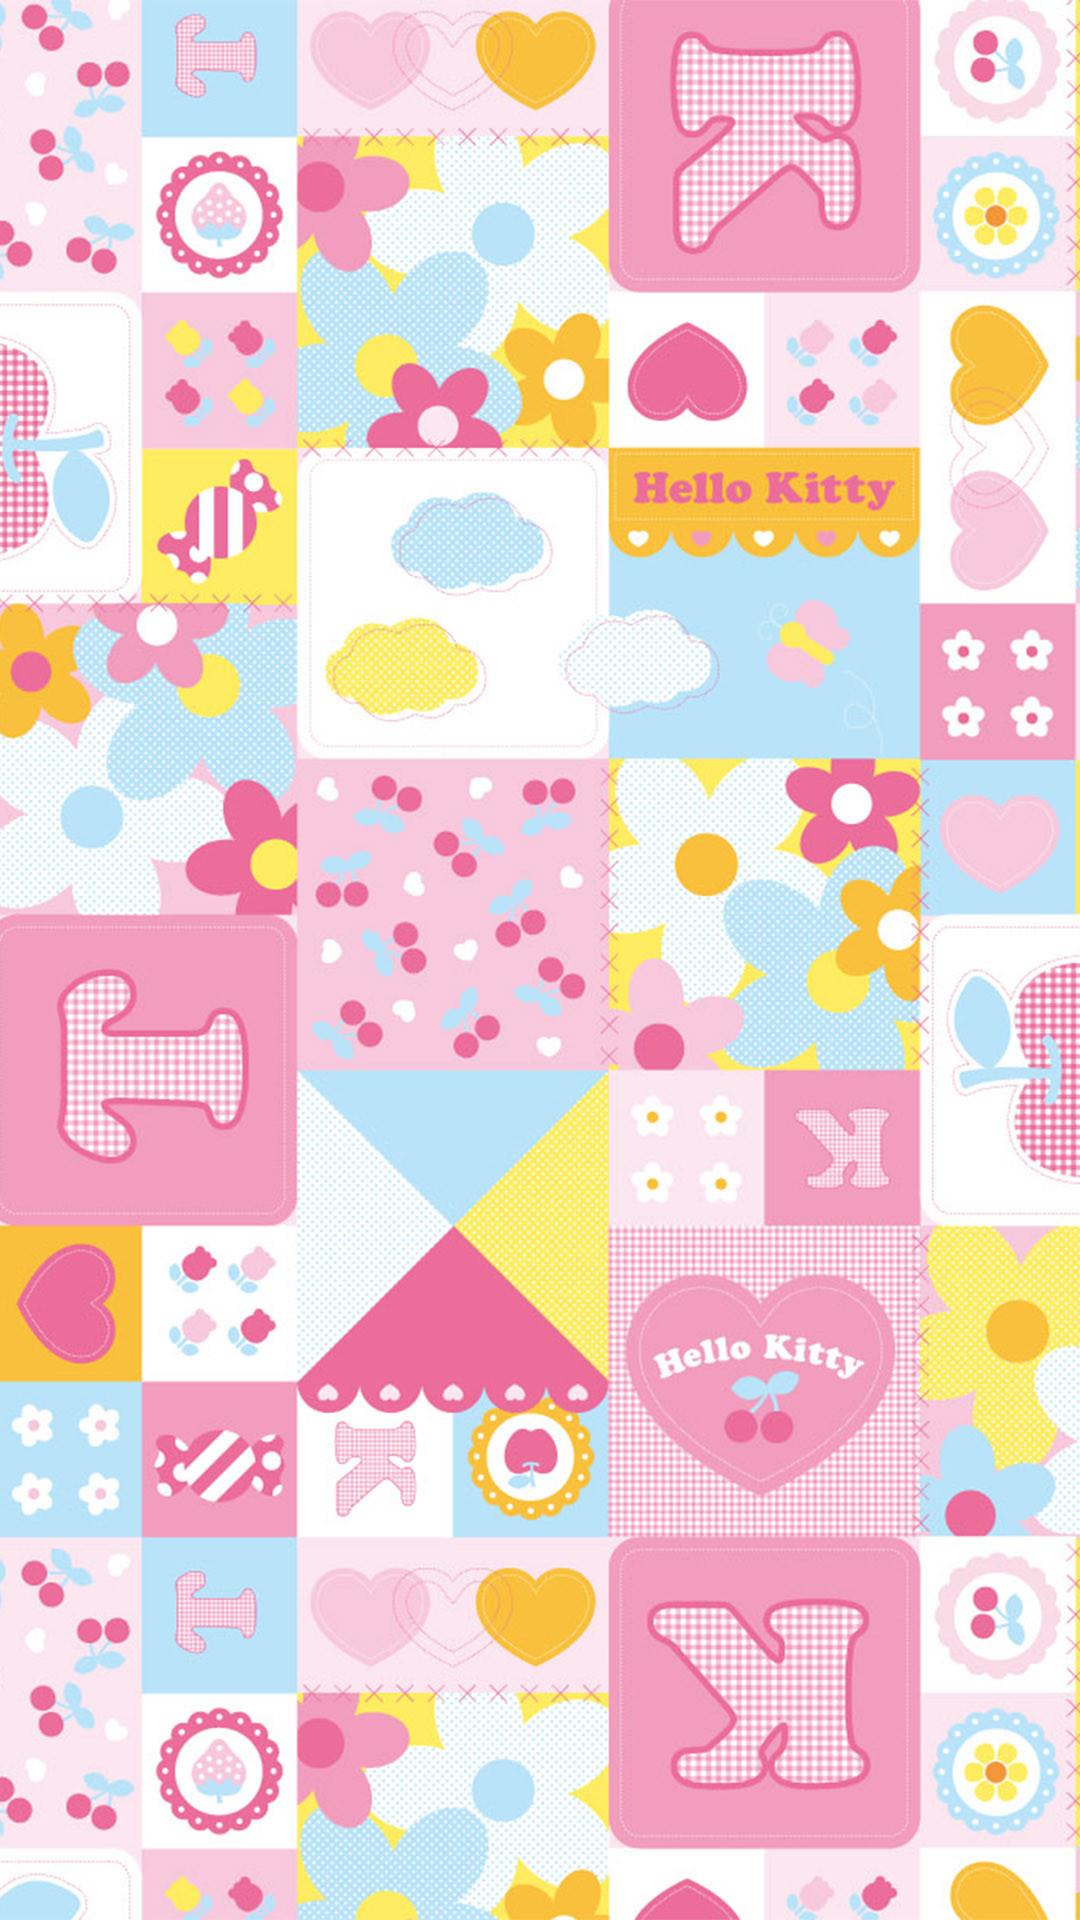 Wonderful Wallpaper Hello Kitty Iphone 6s Plus - 153702  Gallery_511429.jpg